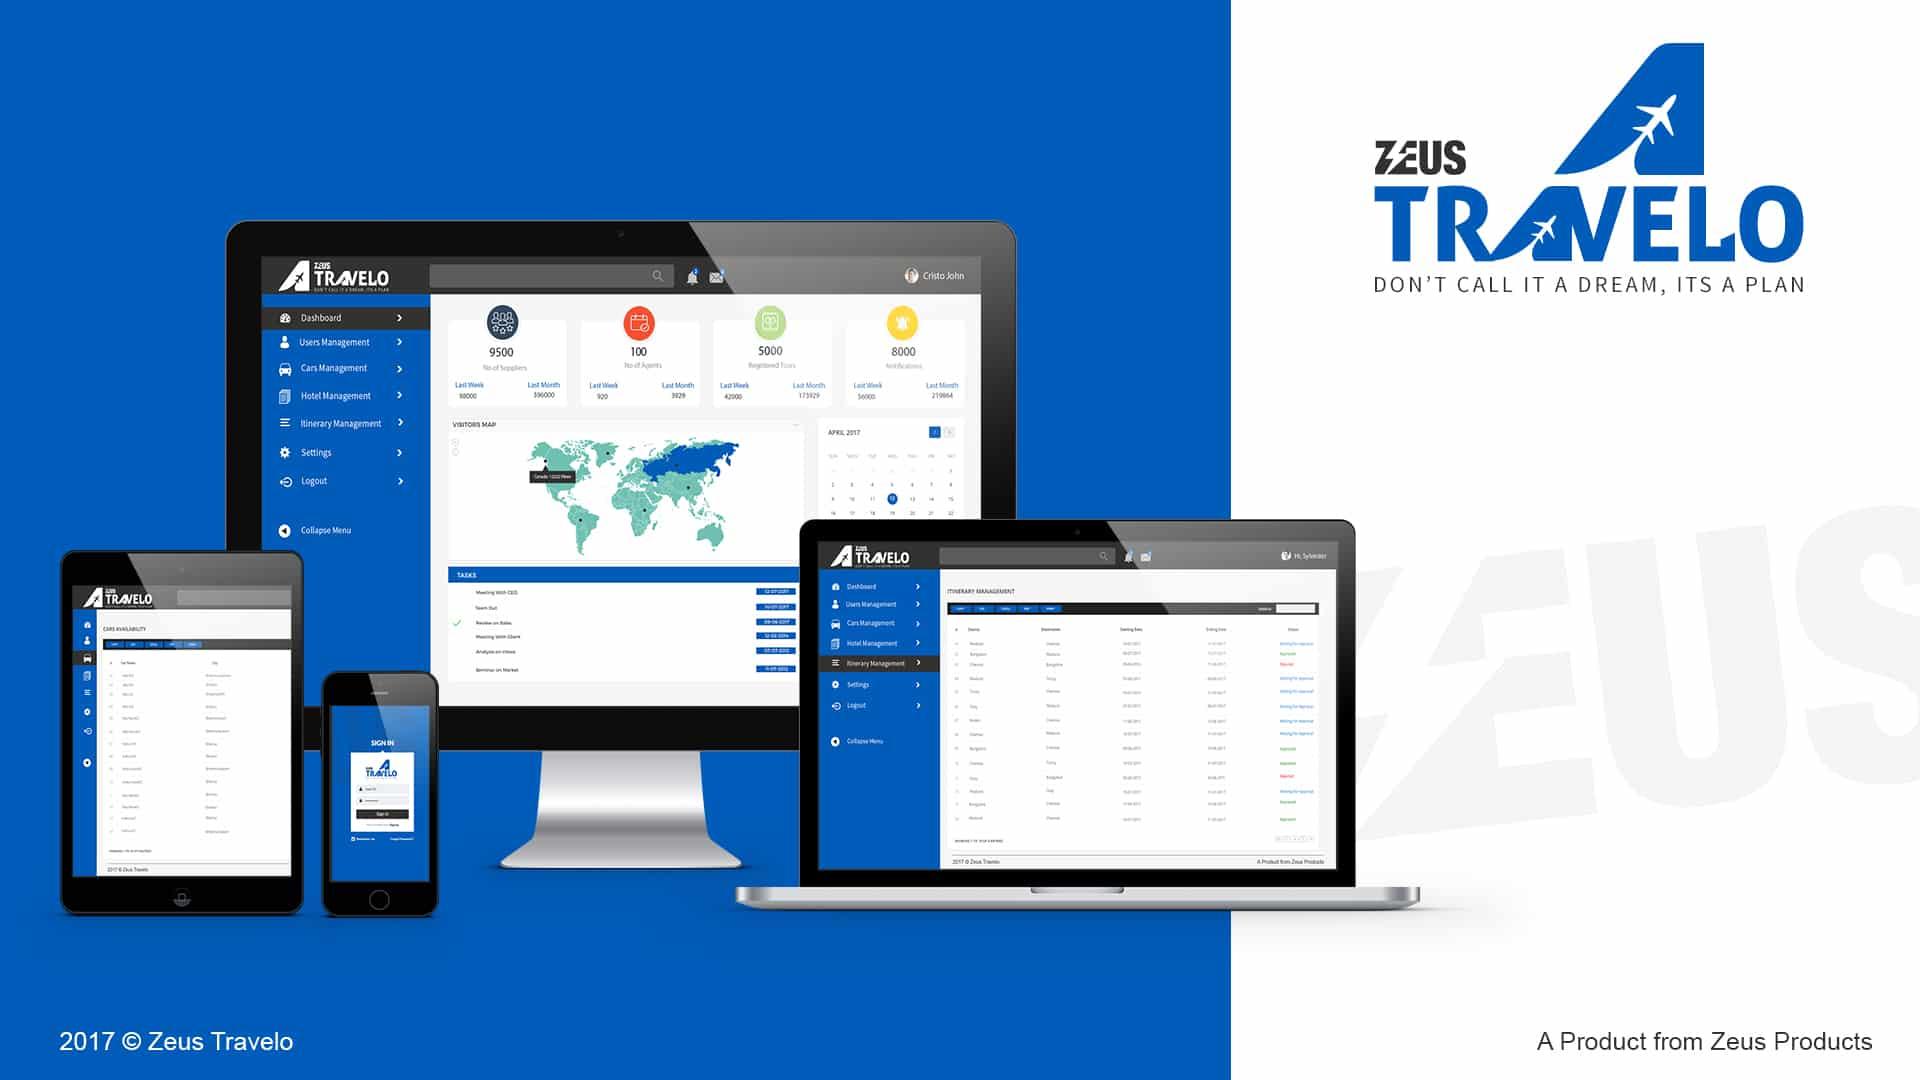 Zeus Tourist Software Products